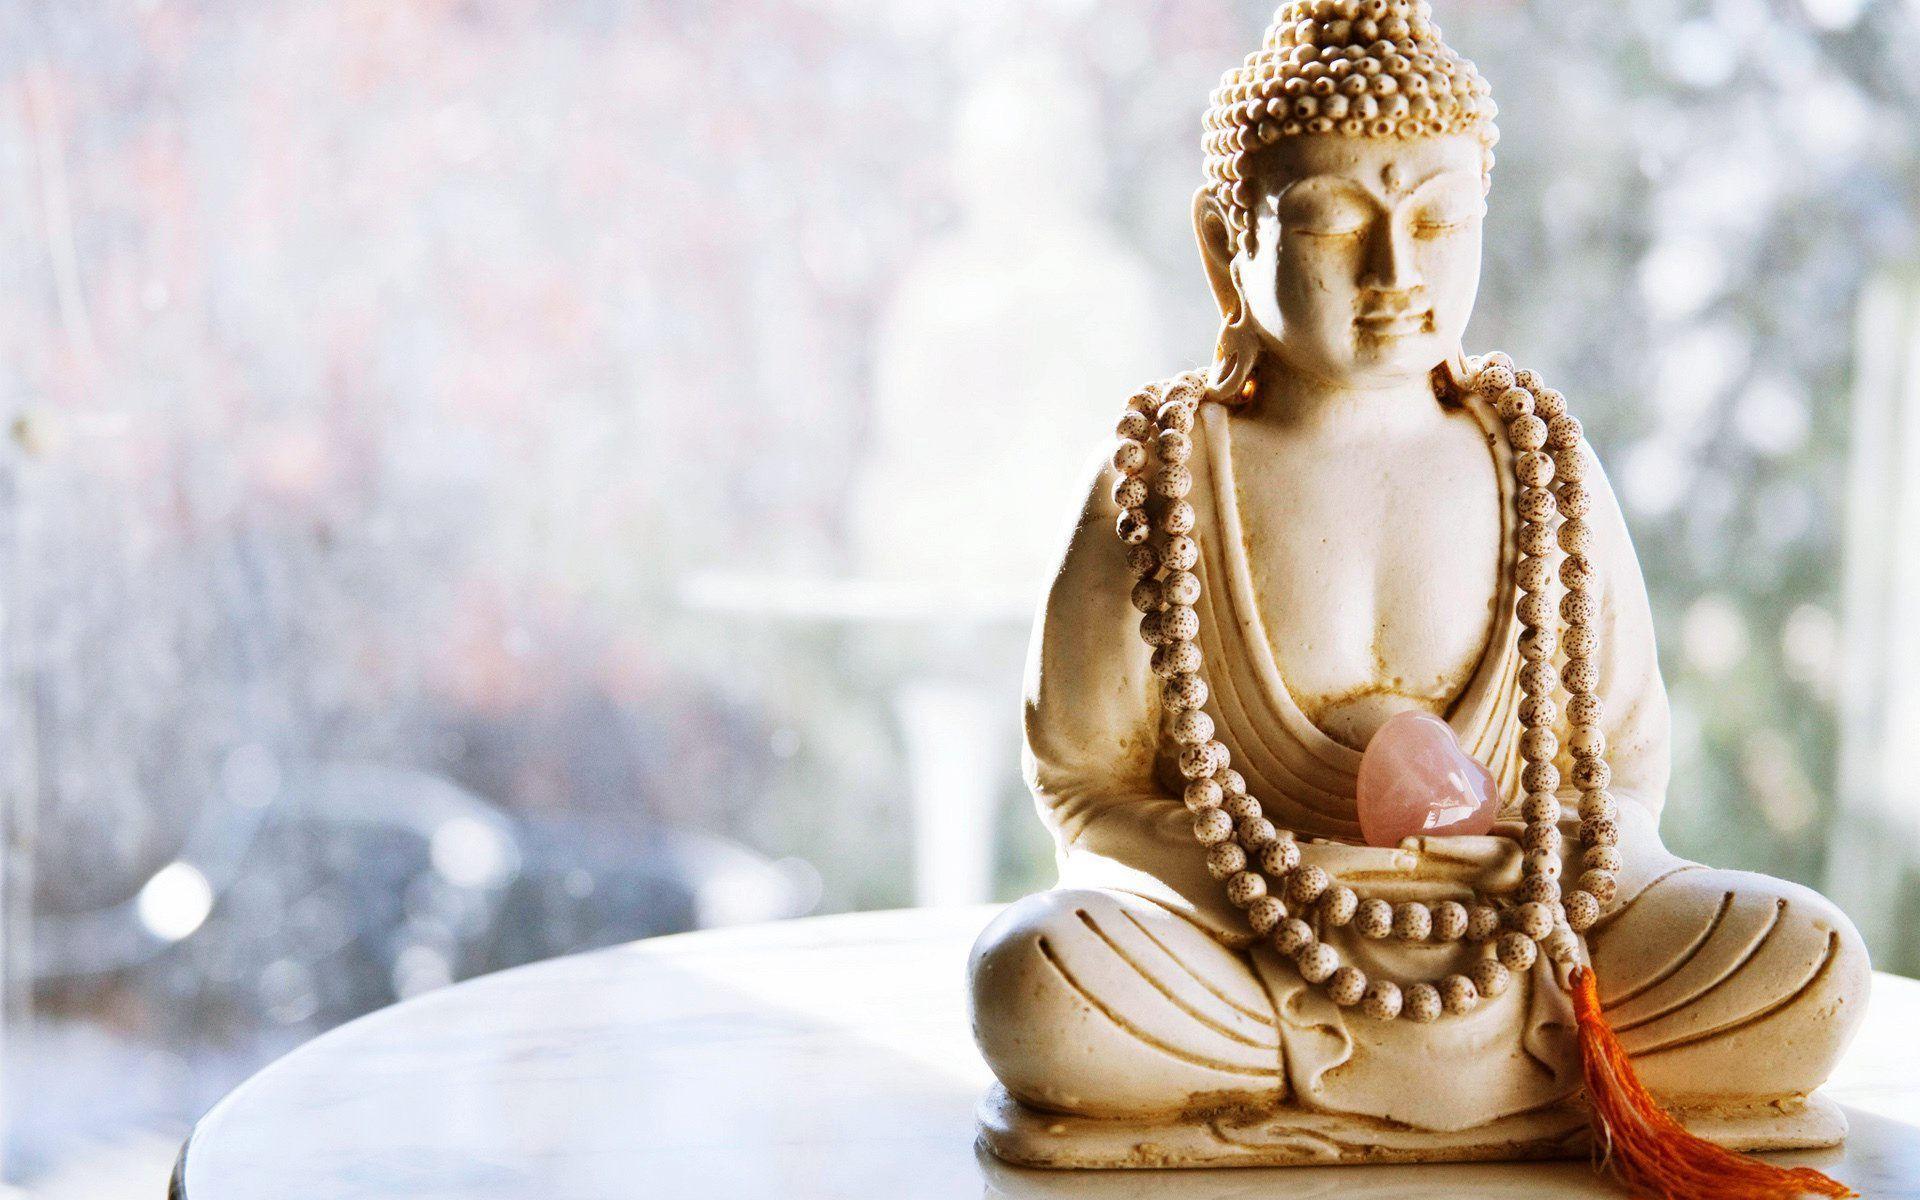 Buddha Wallpaper 8k: 52 Best Free Buddhism Wallpapers